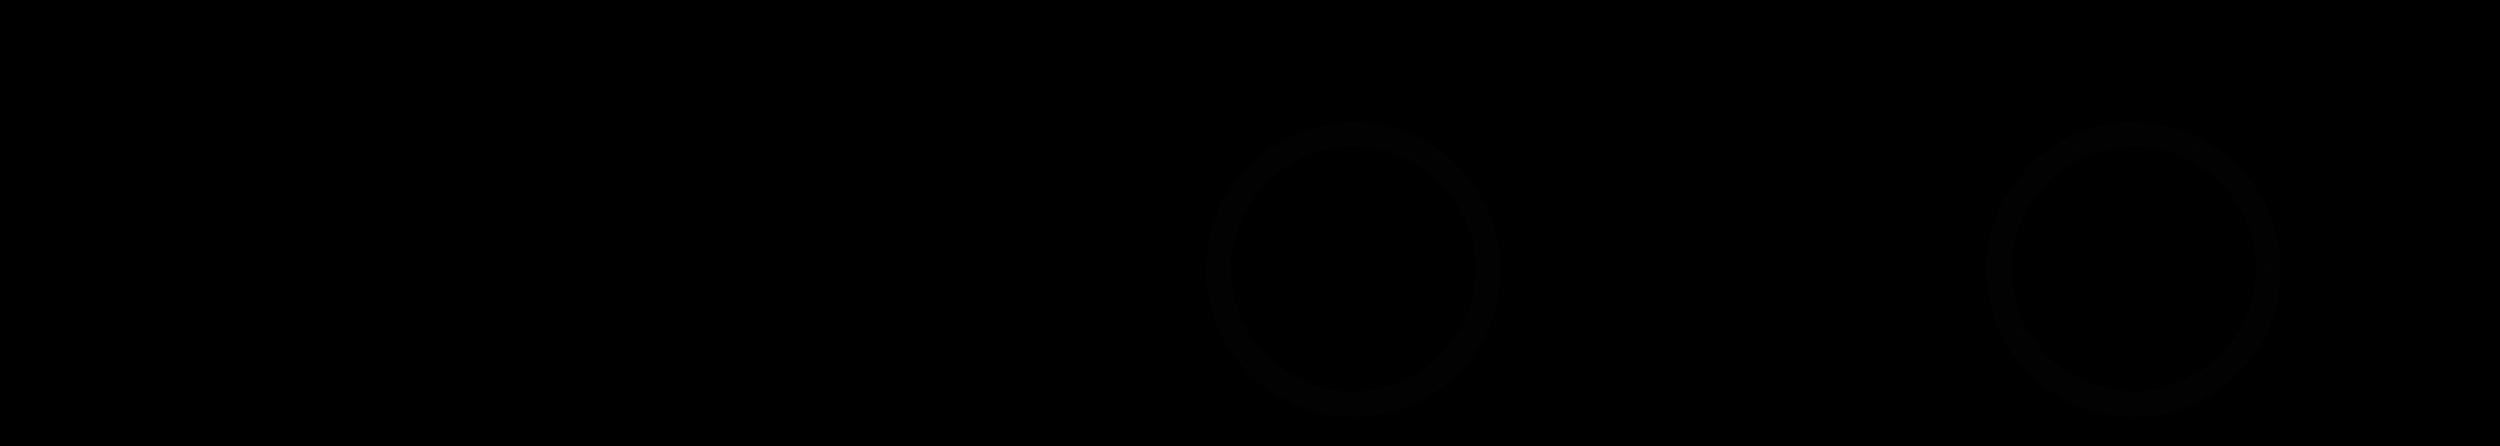 MicroDot Logo.png